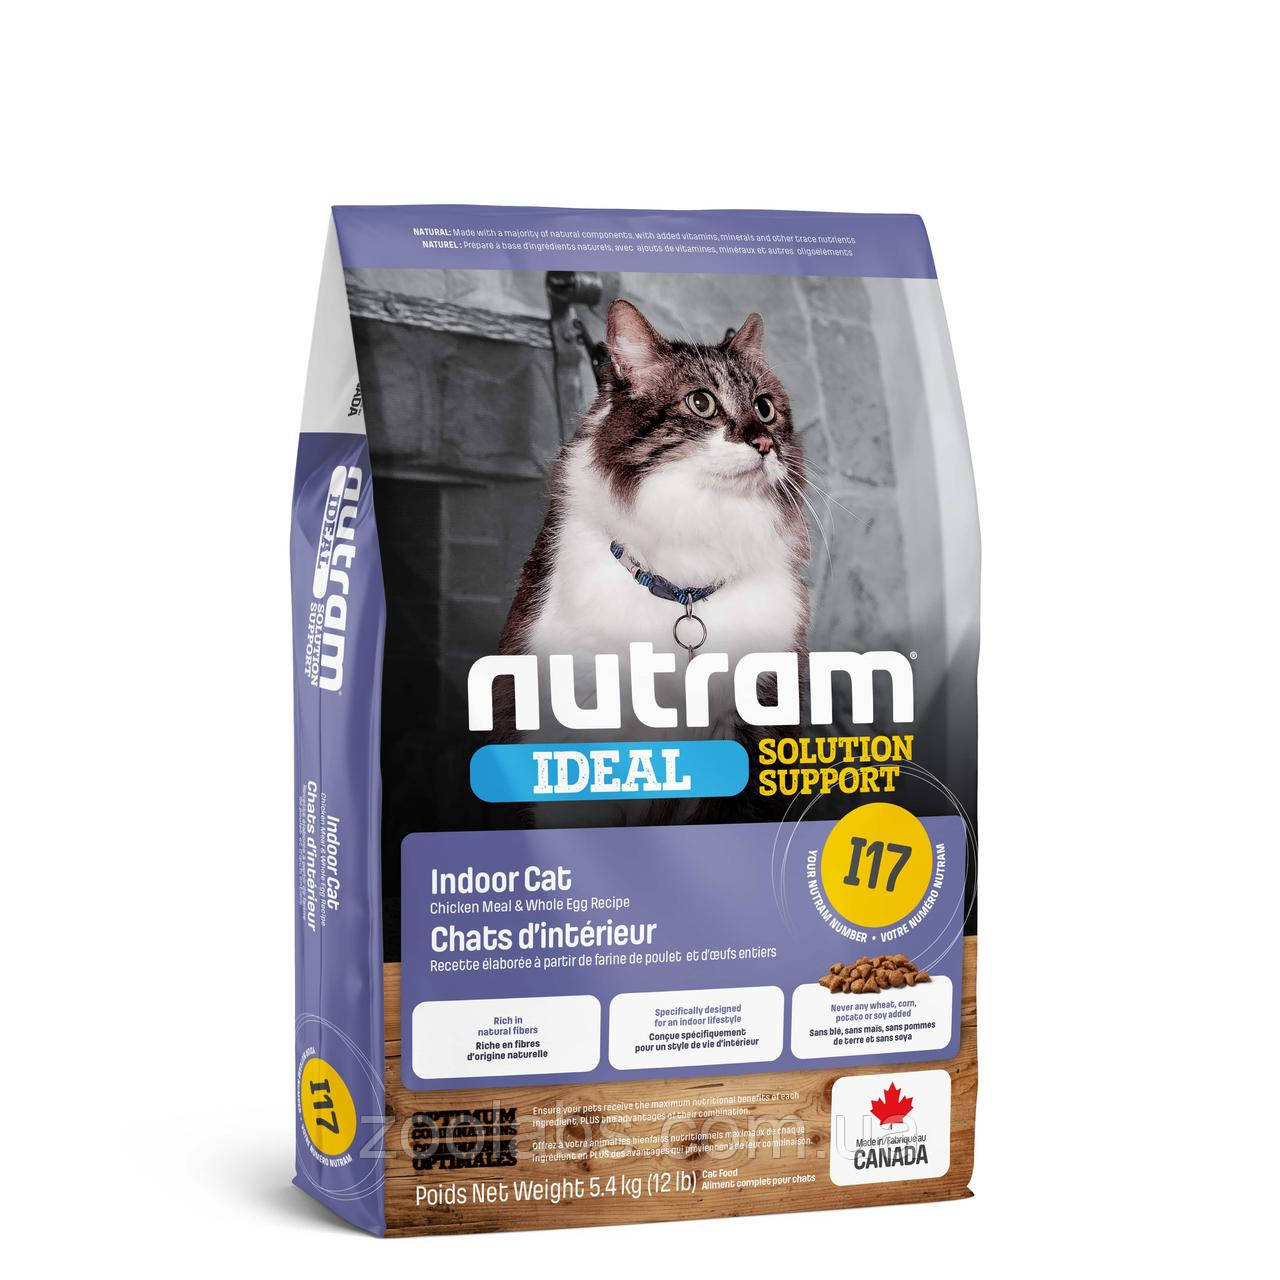 Корм Nutram для взрослых кошек | Nutram I17 Ideal Solution Support Finicky Indoor Cat Food 320 грамм